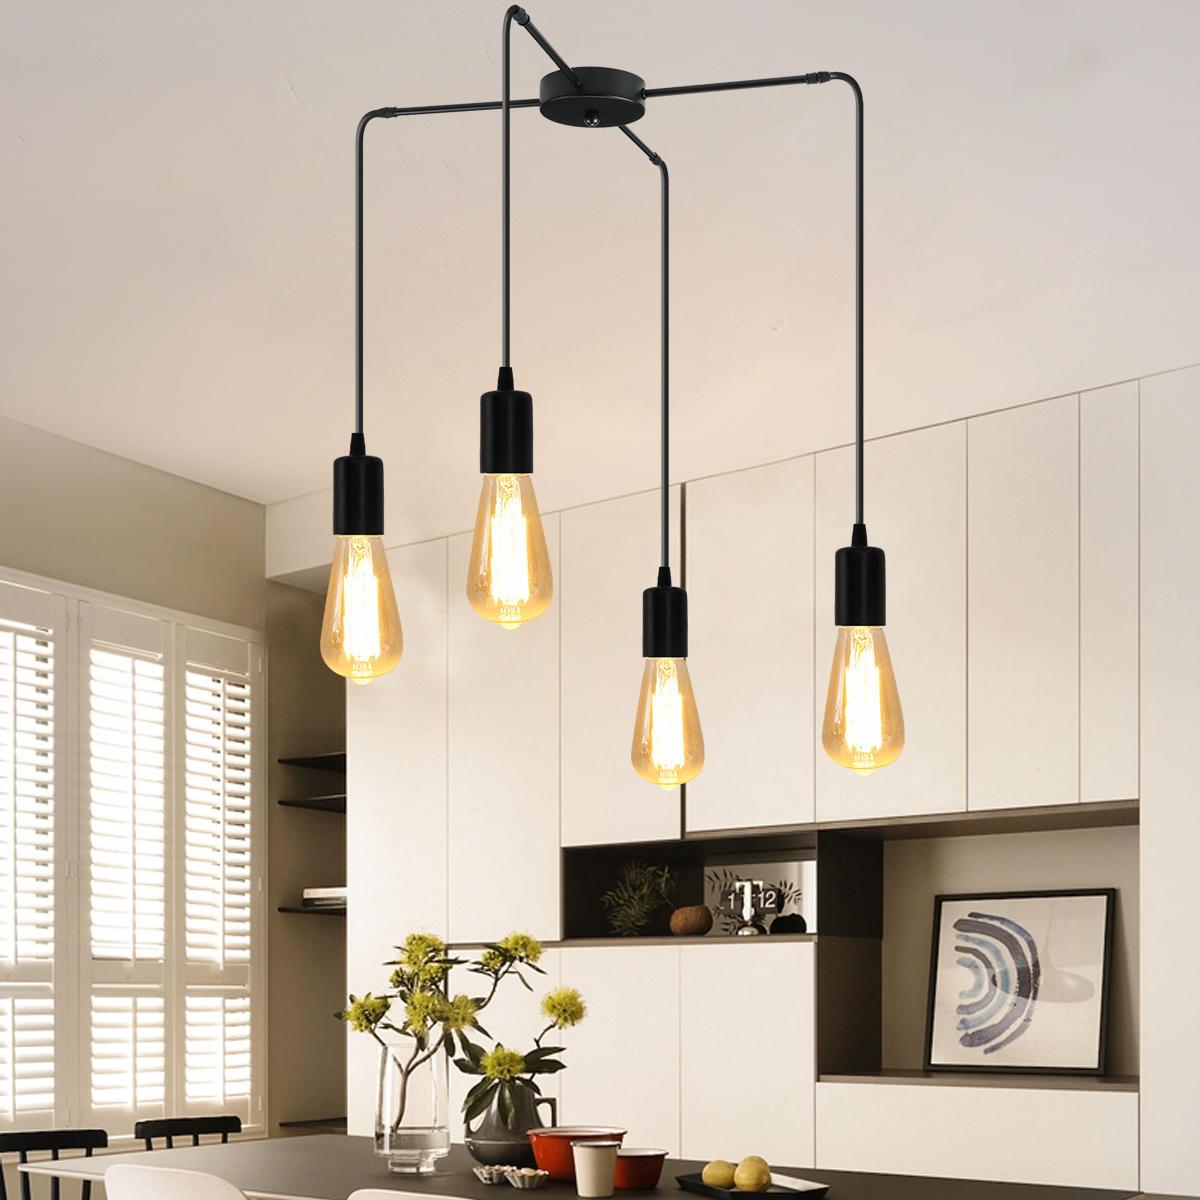 4 Köpfe E27 Moderne LED Kronleuchter verstellbare Pendelleuchte Deckenlampe